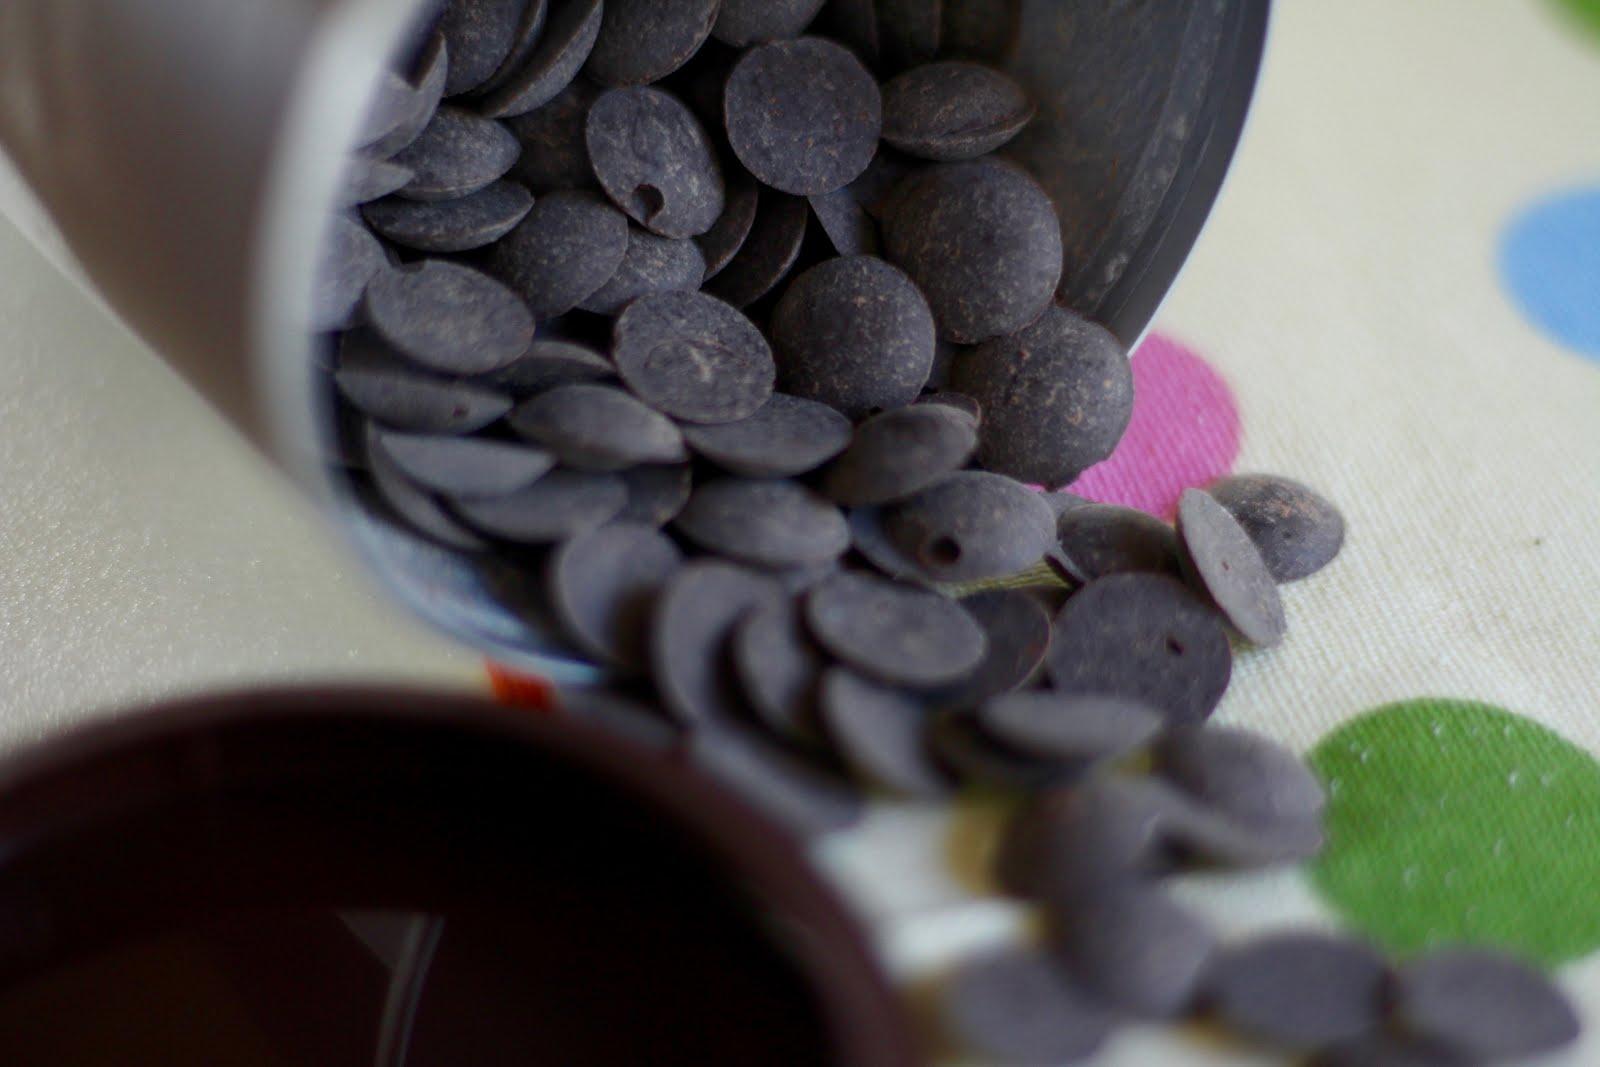 Low Carb Schoko Drops - Rotweinkuchen Low Carb Video und Rezept   Sugarprincess